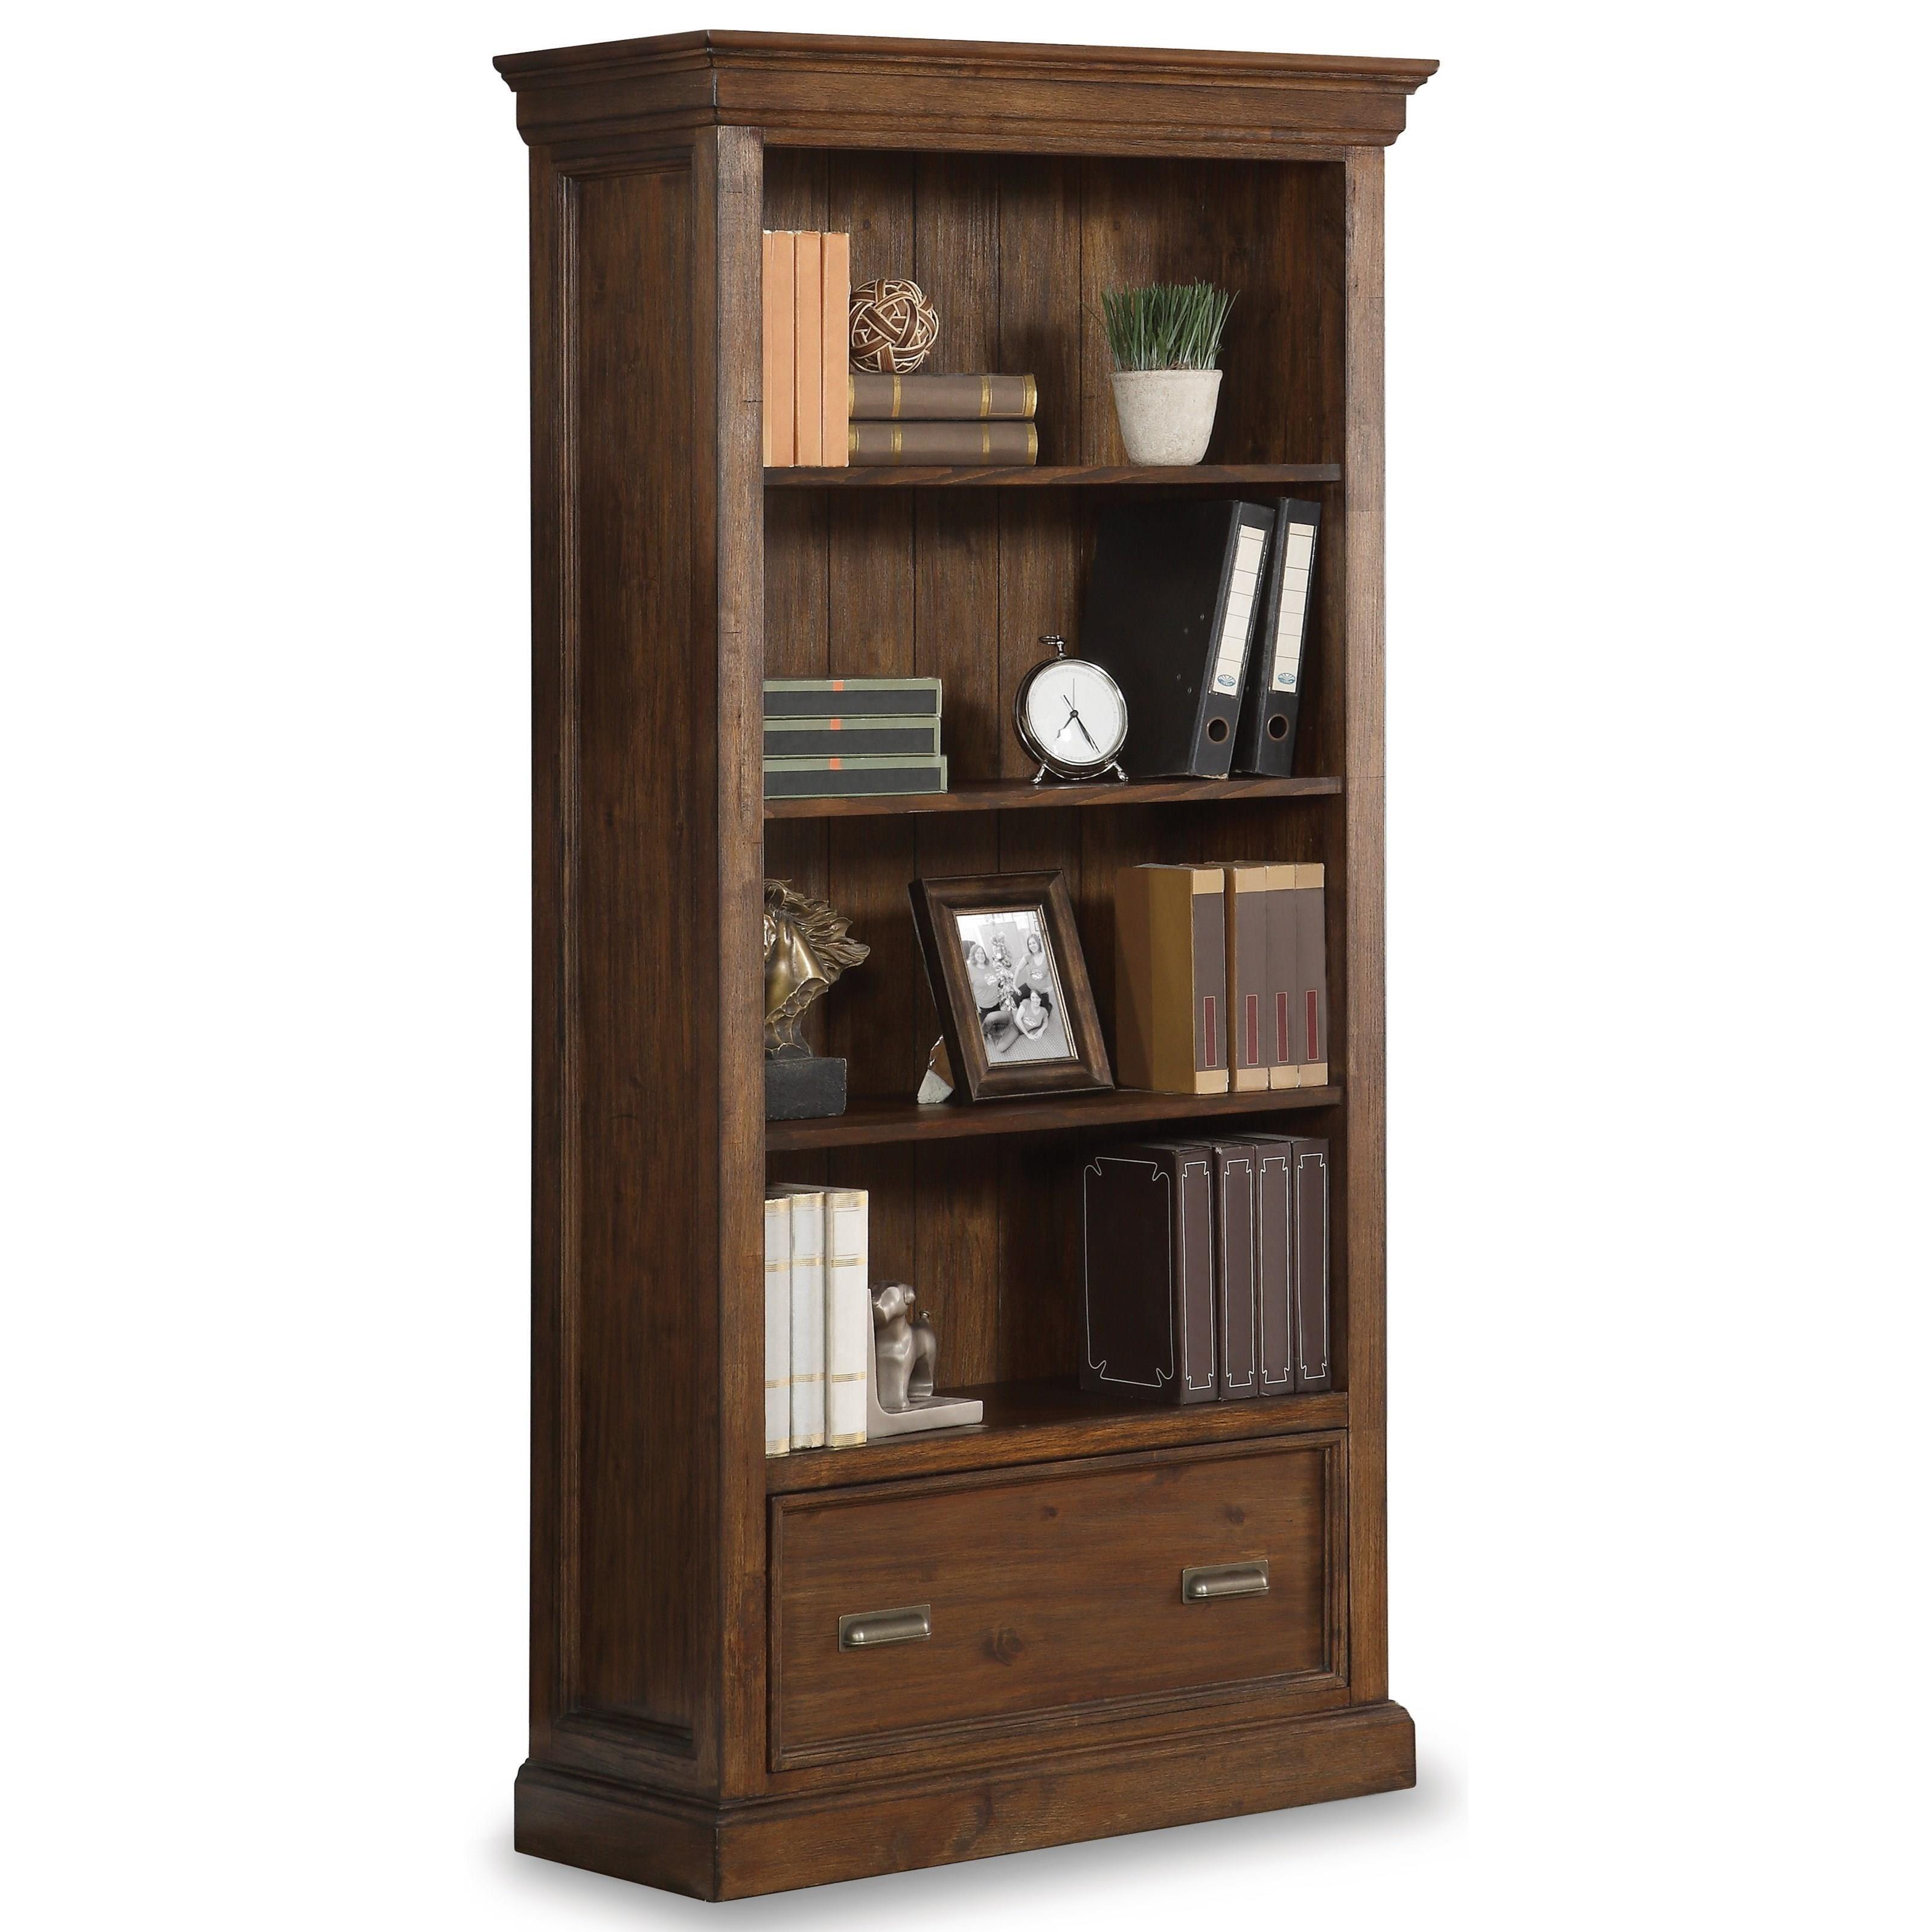 Flexsteel Wynwood Collection Herald File Bookcase  - Item Number: W1327-702